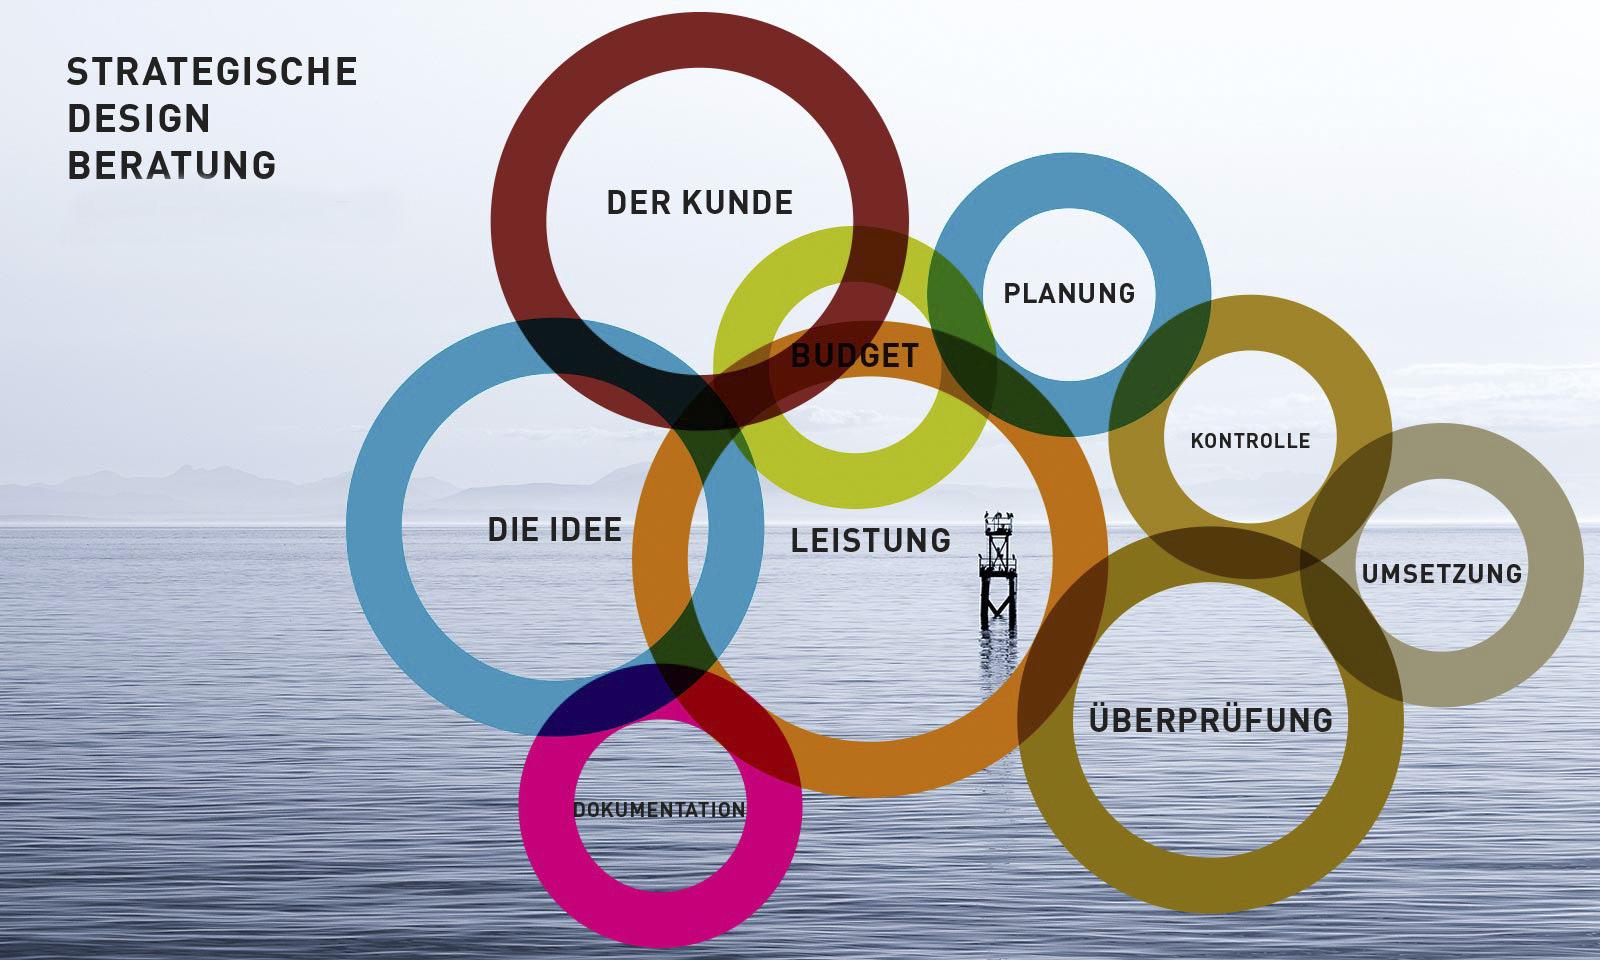 Strategische Design Beratung